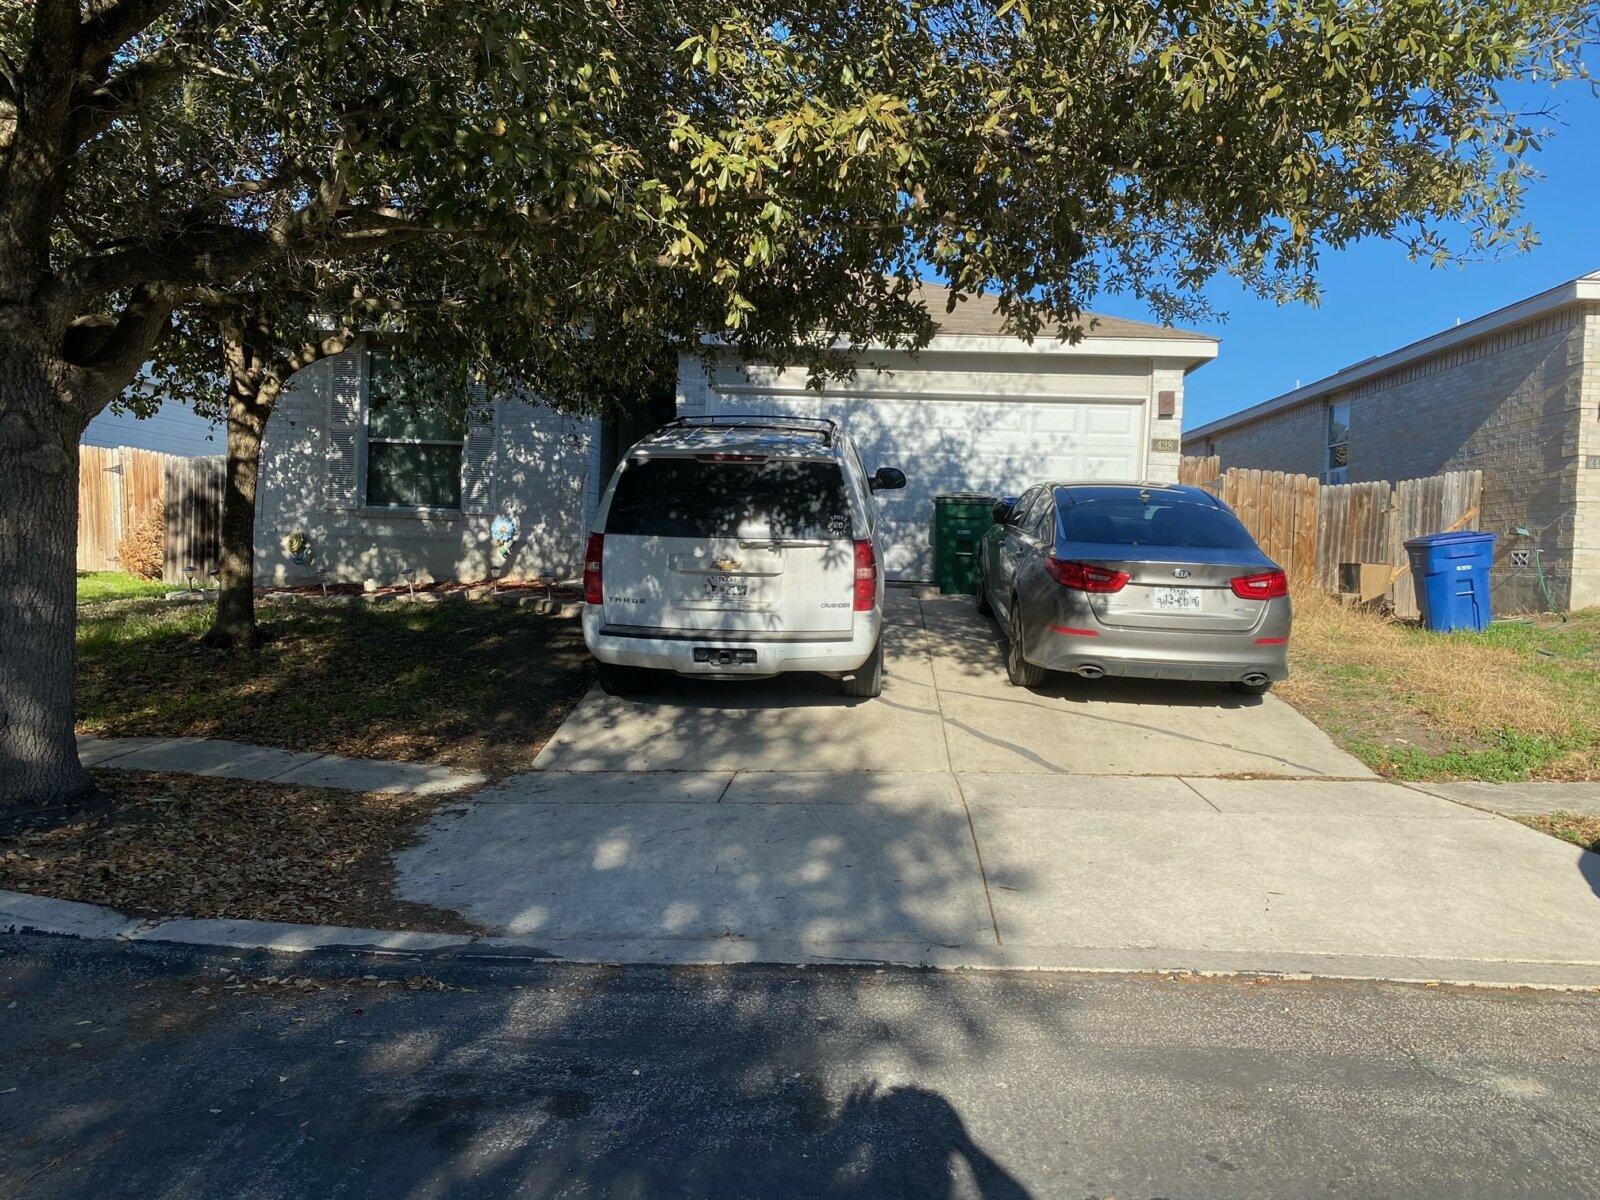 438 Jockey | HOT Wholesale Deal in San Antonio, TX